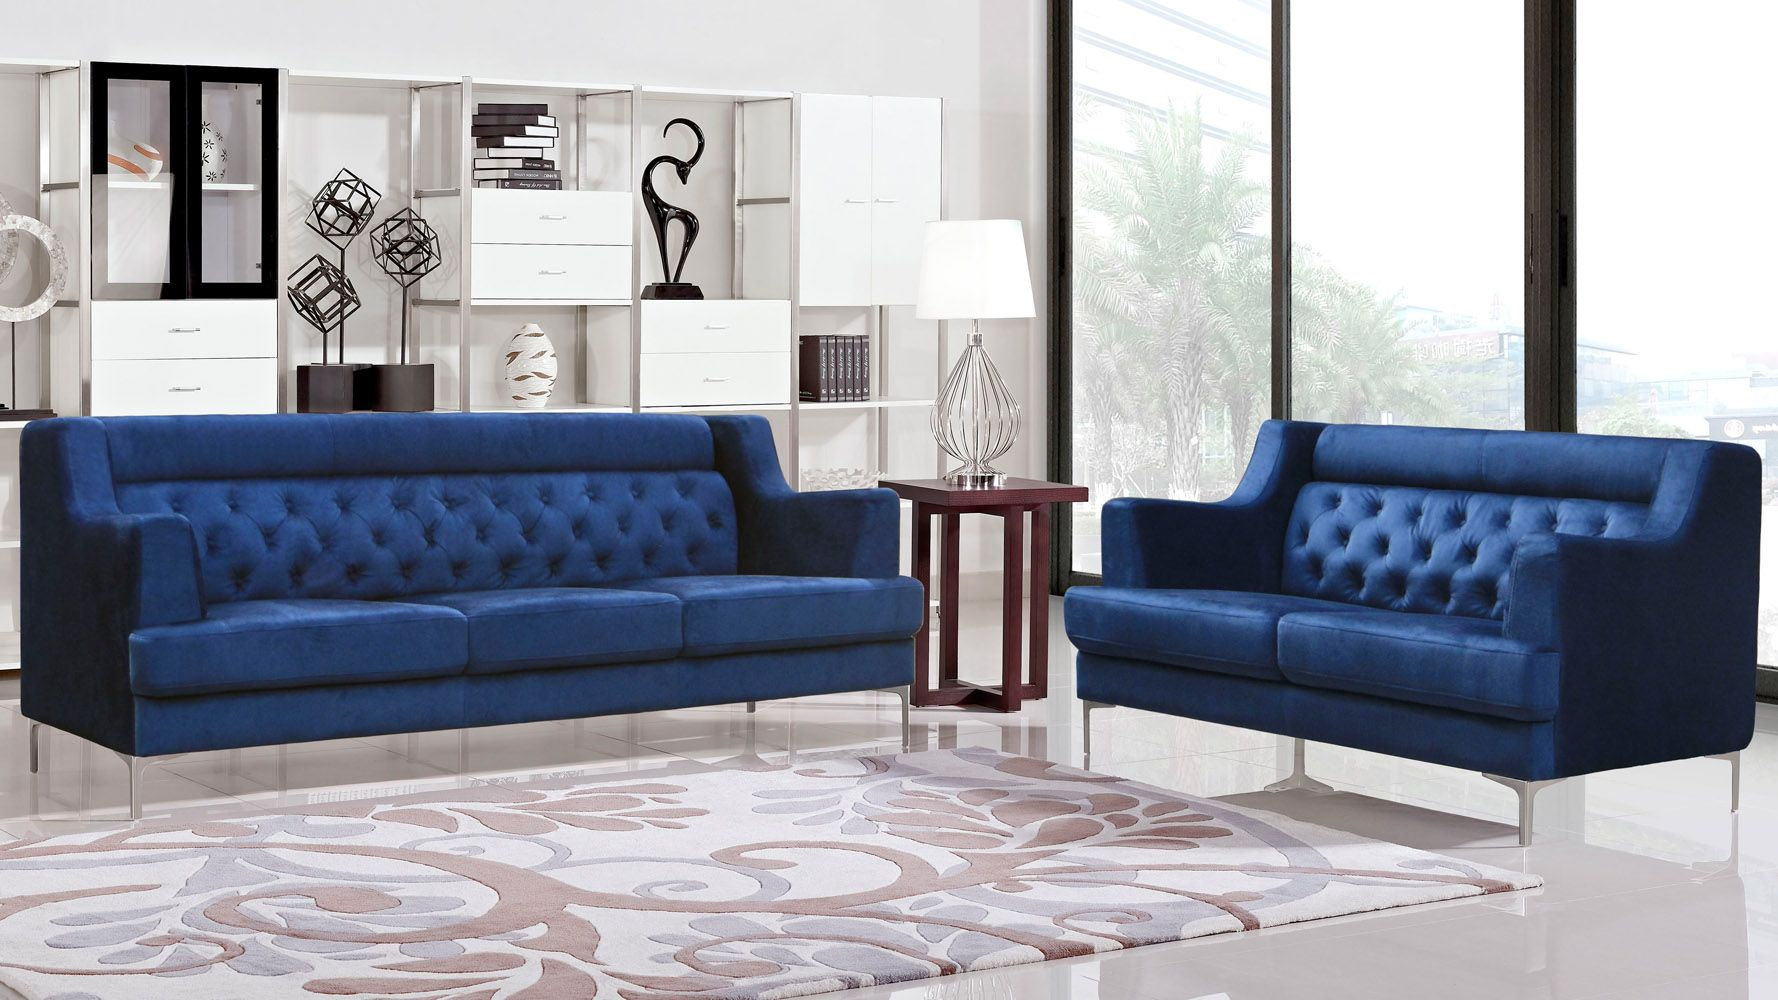 Best Zara Fabric Tufted Sofa With Chrome Legs Navy Blue 400 x 300